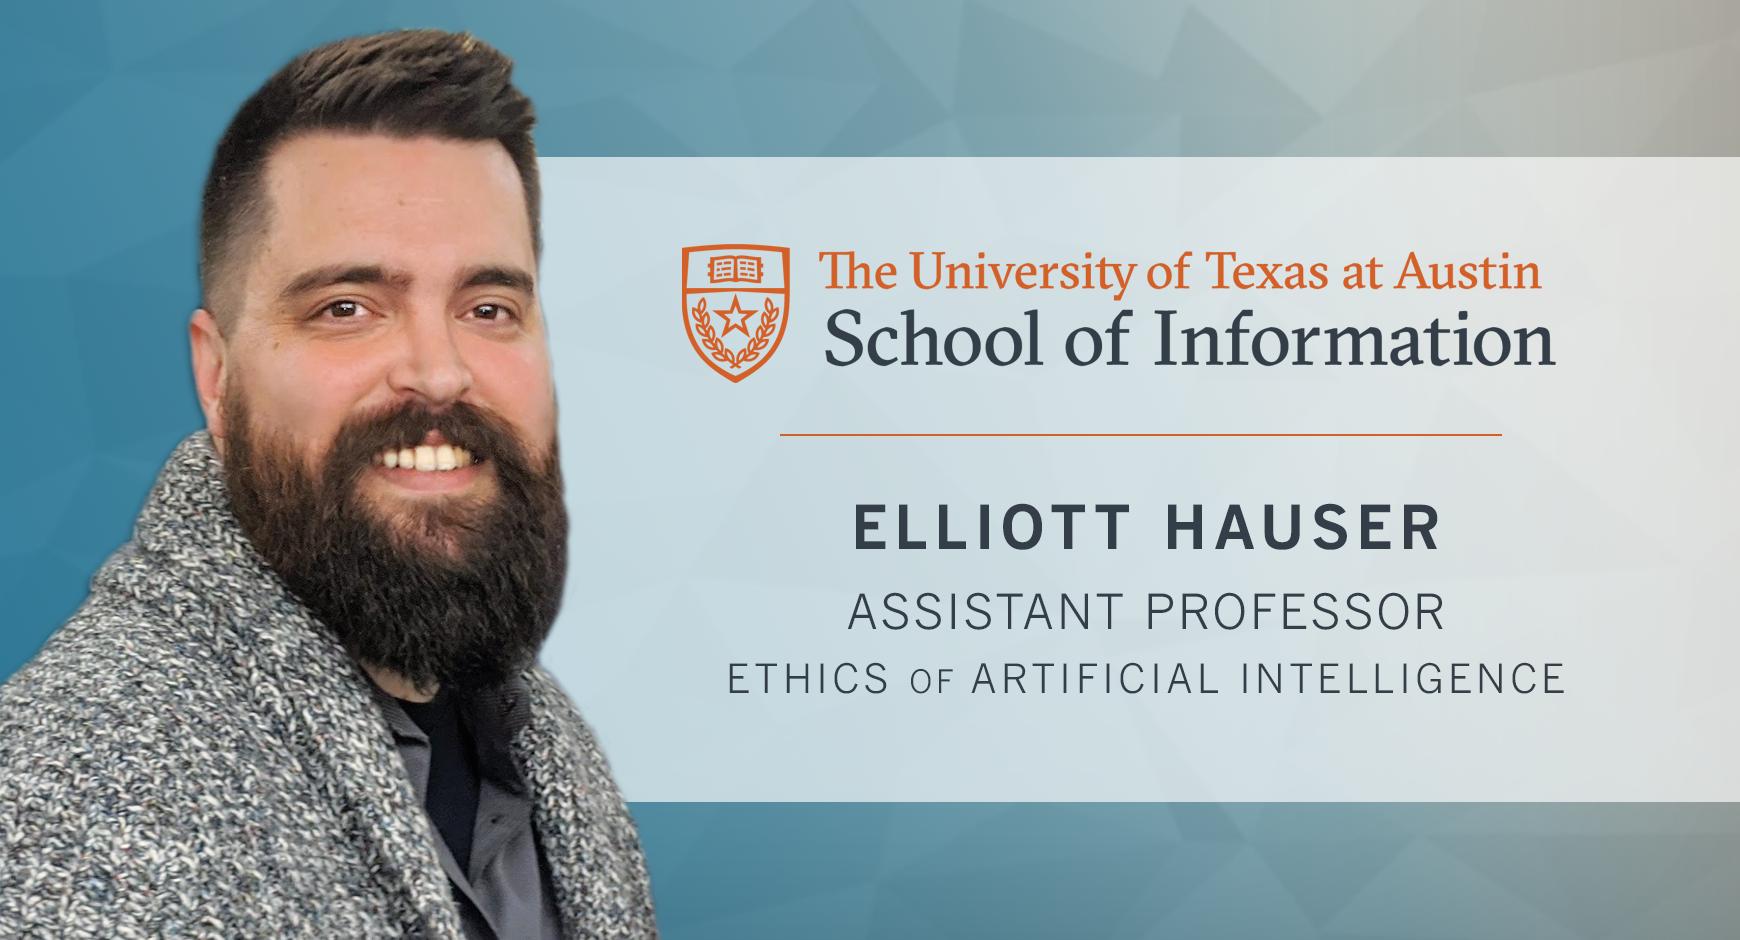 Elliott Hauser